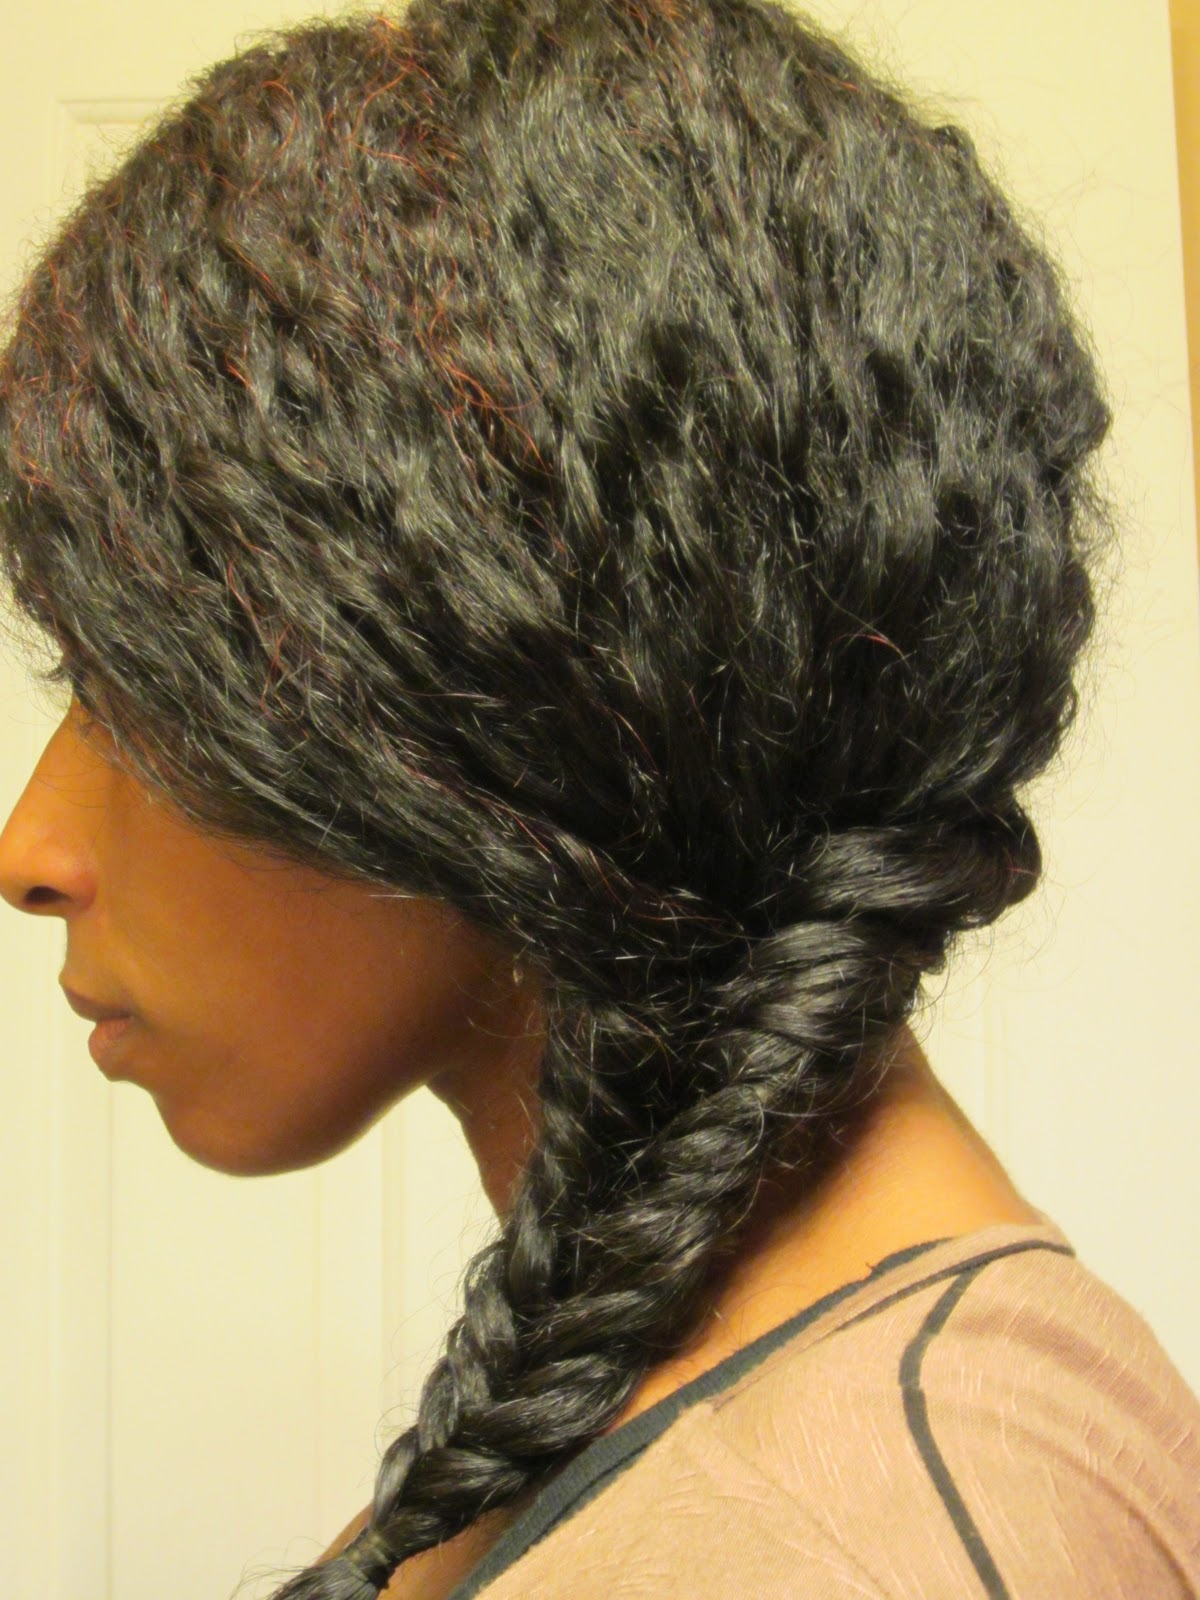 Naturally Beautiful Hair: Fish Tail Braid!